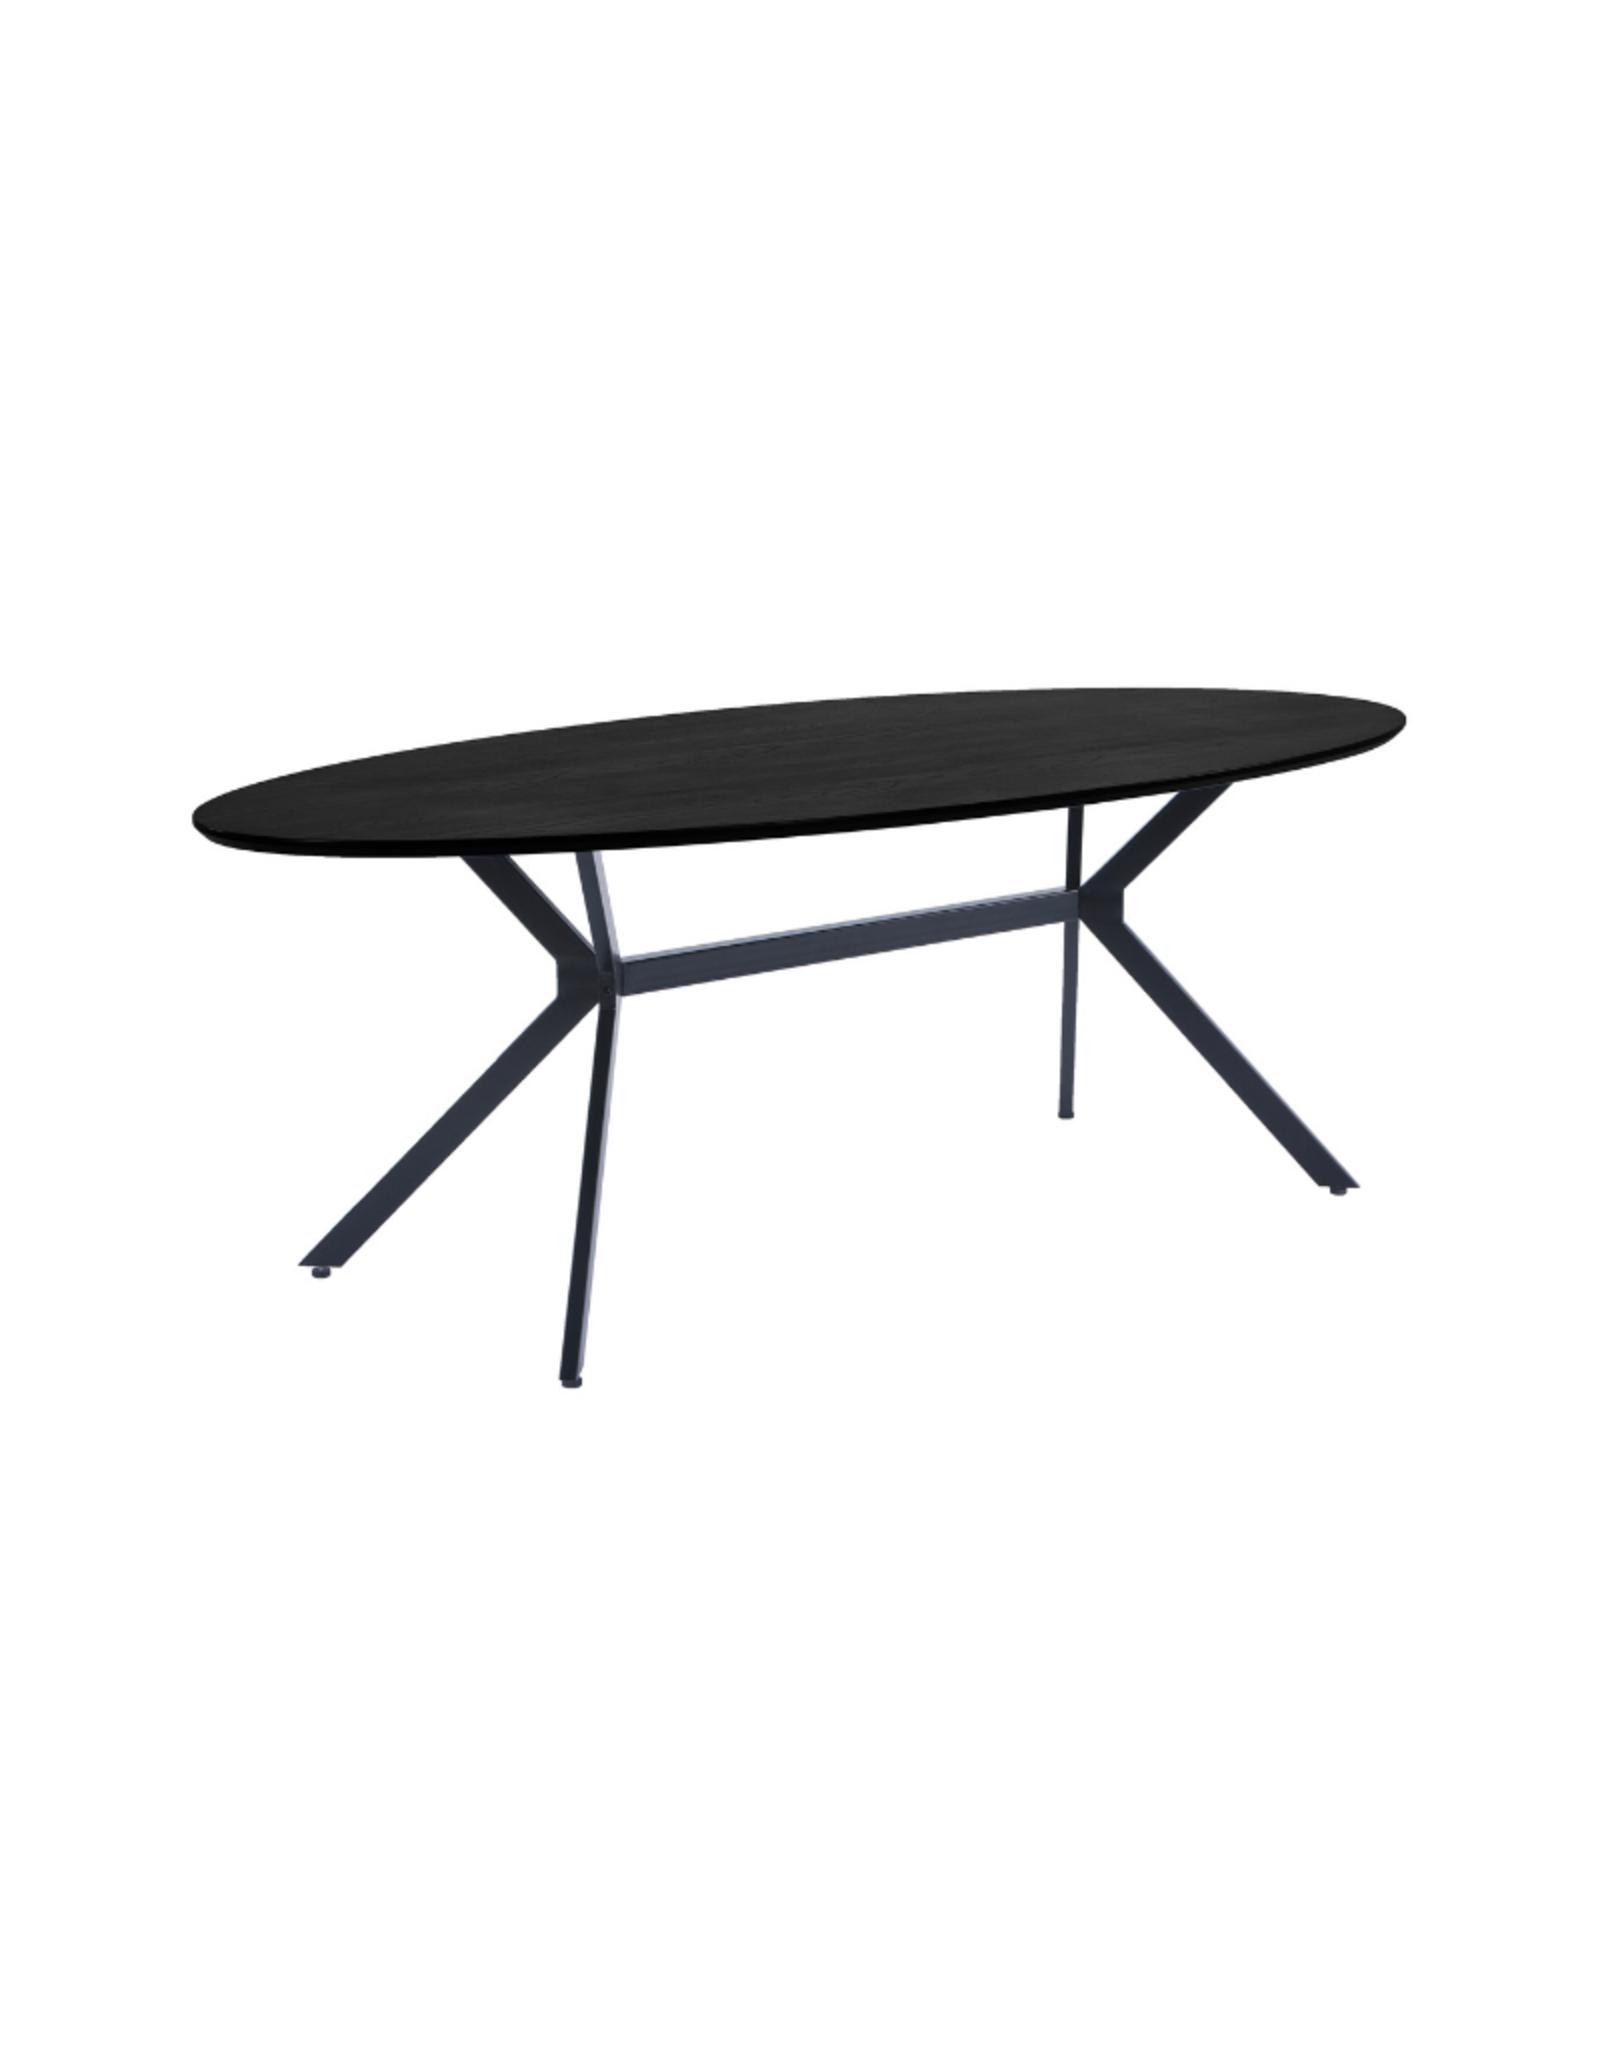 Eettafel Ellips 220 x 100 cm - Zwart